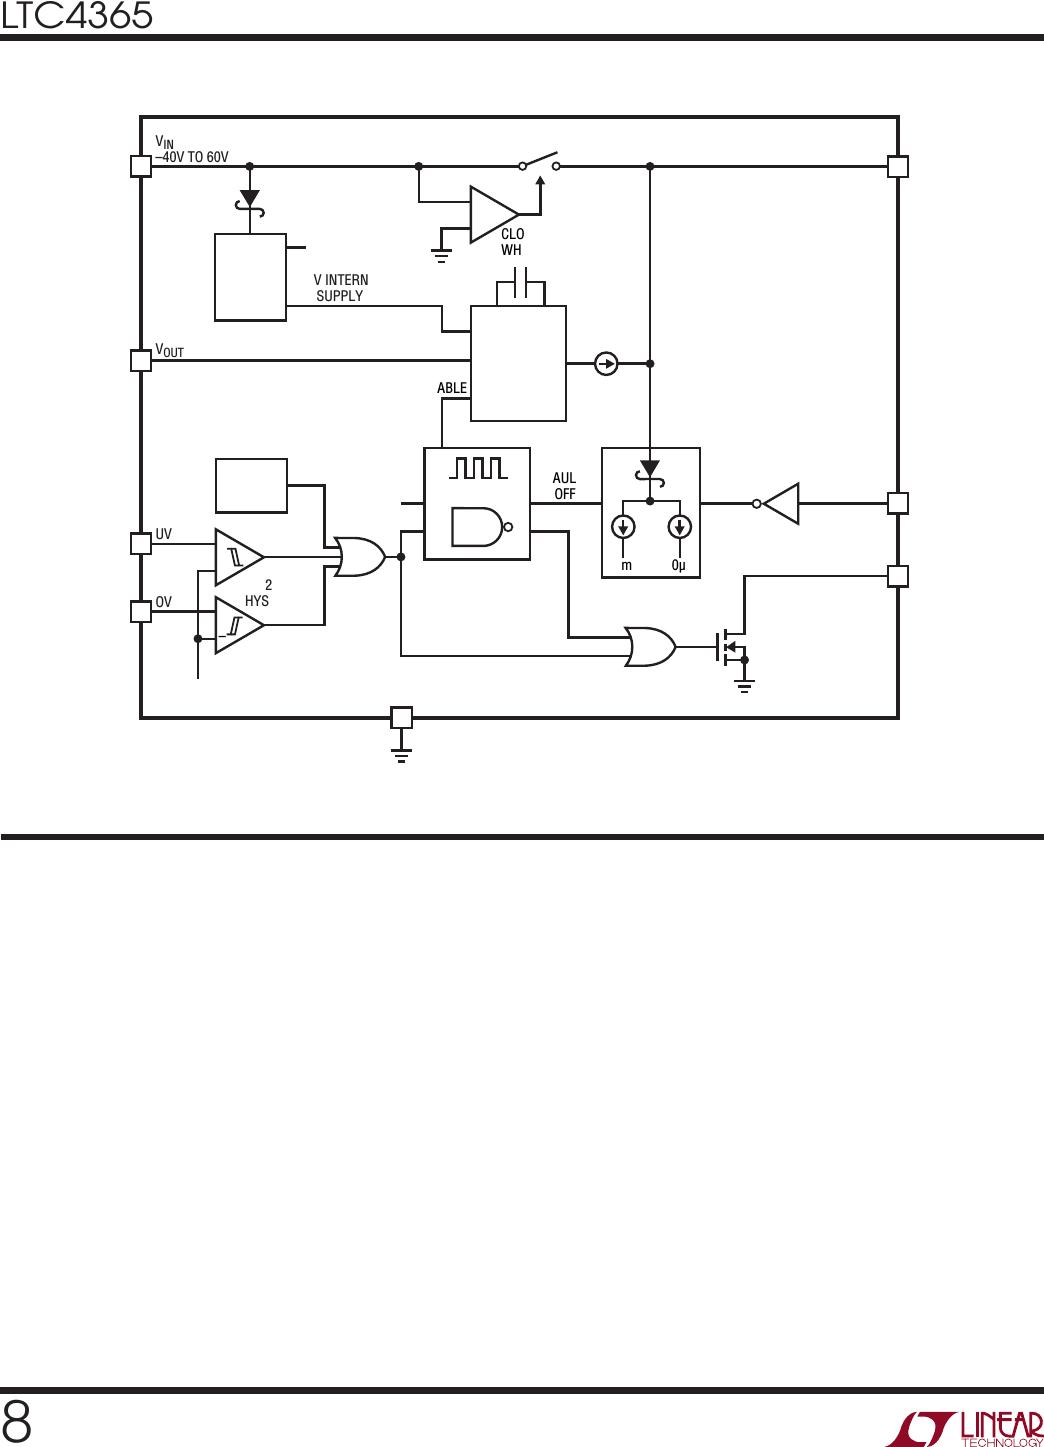 hight resolution of ltc4365